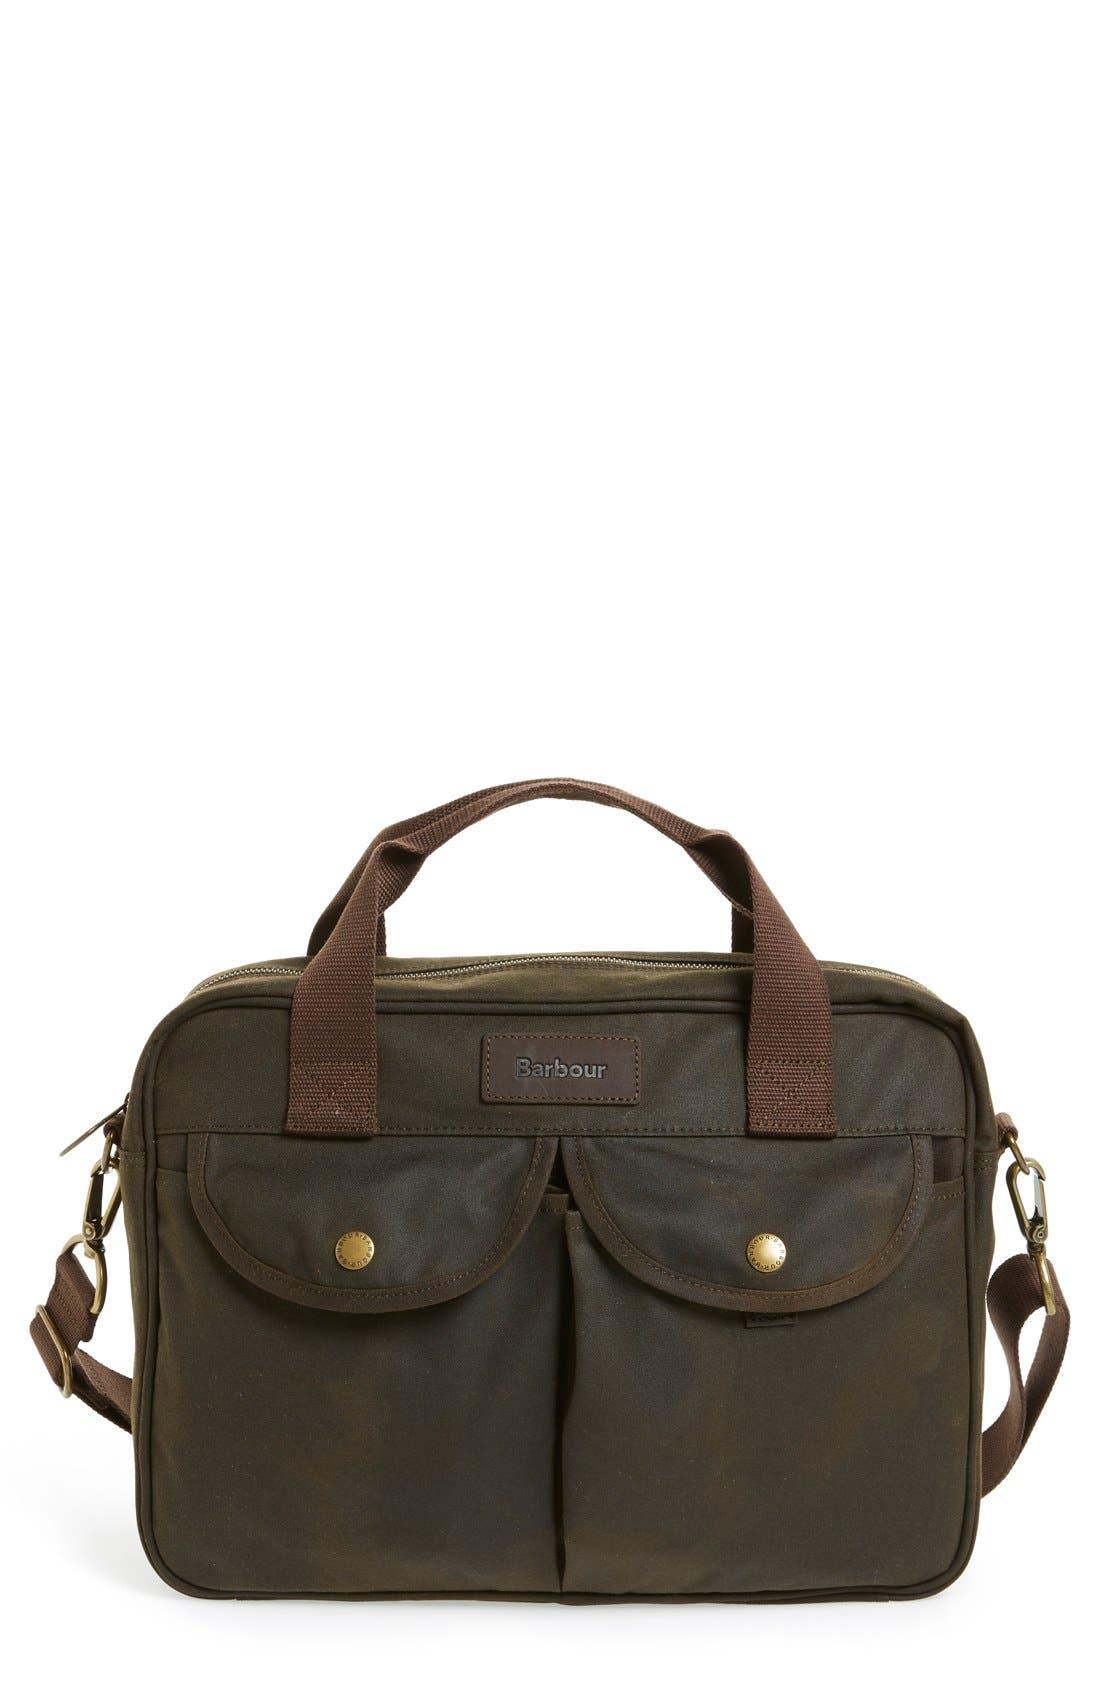 BARBOUR 'Longthorpe' Waxed Canvas Laptop Bag, Main, color, OLIVE